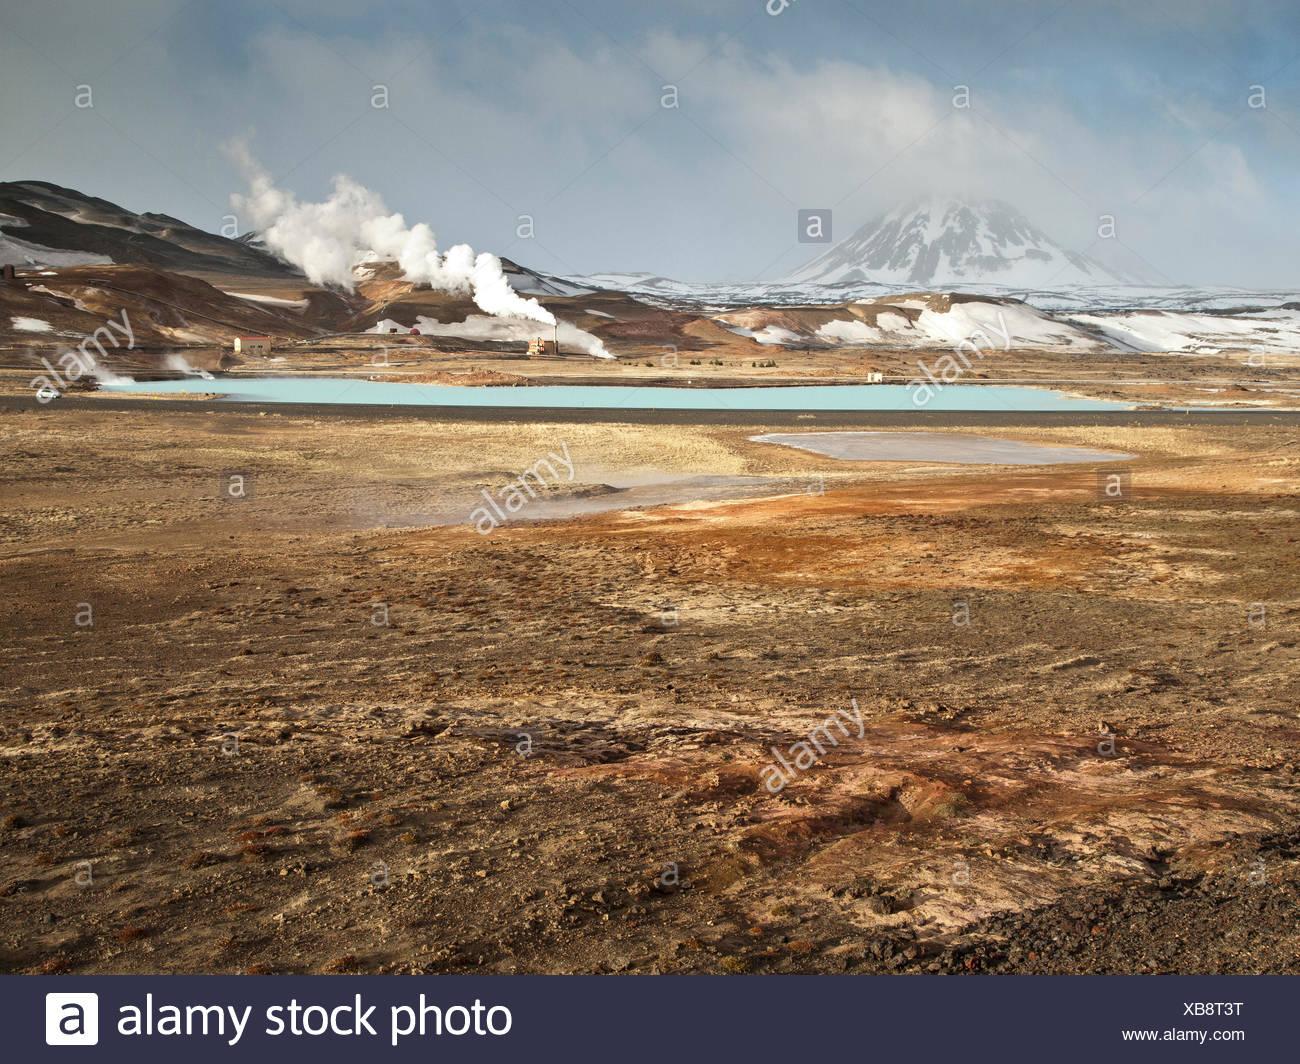 Vapore, vapore, calore di terra, Islanda, Europa, power station, Myvatn, Reykjahild, Therme, calore, inverno, geotermica, Foto Stock